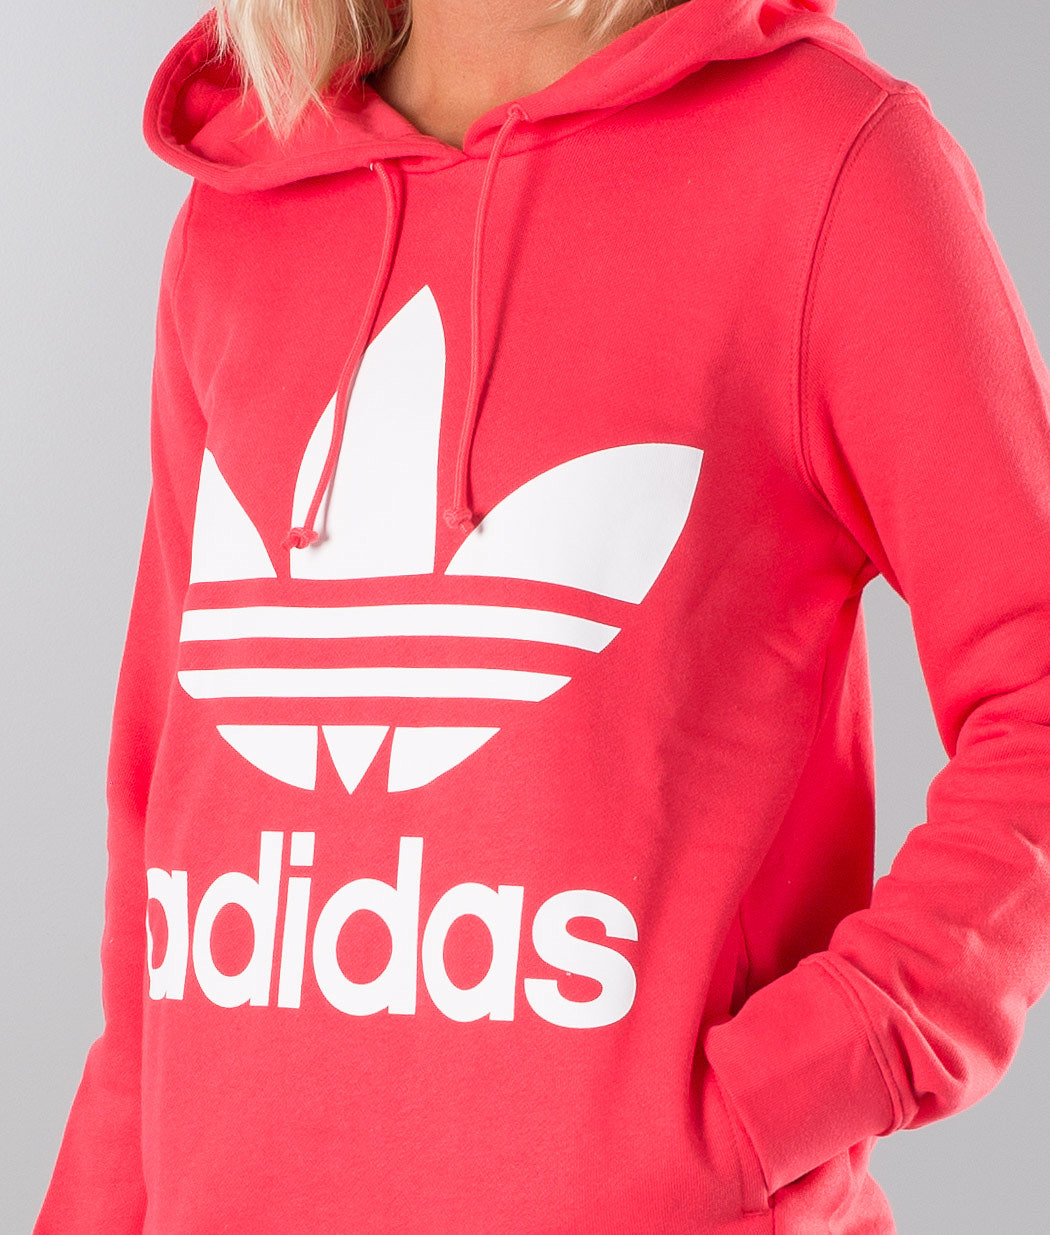 Adidas Originals Trefoil Huppari Core Pink - Ridestore.fi bcf9f5e802